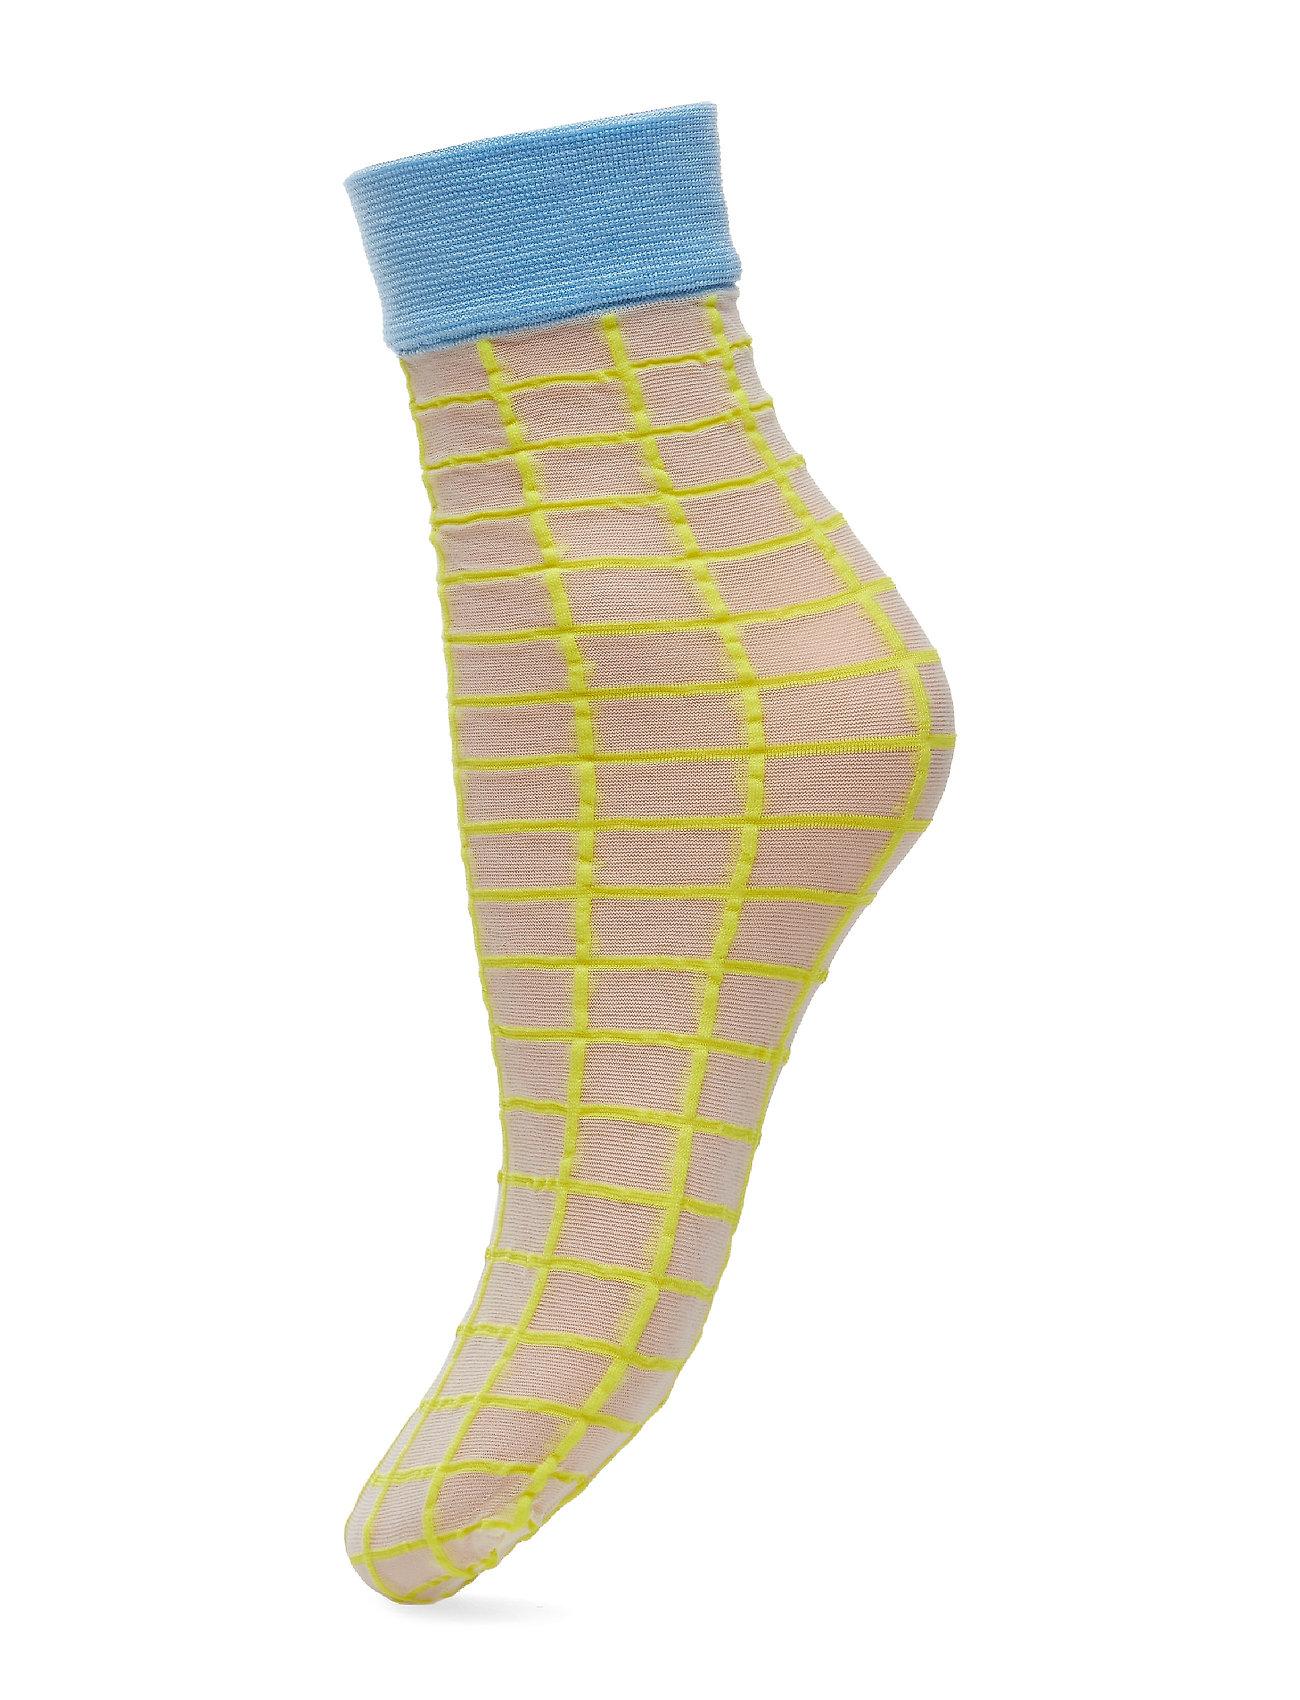 BECKSÖNDERGAARD Dagmar Square Sock - YELLOW